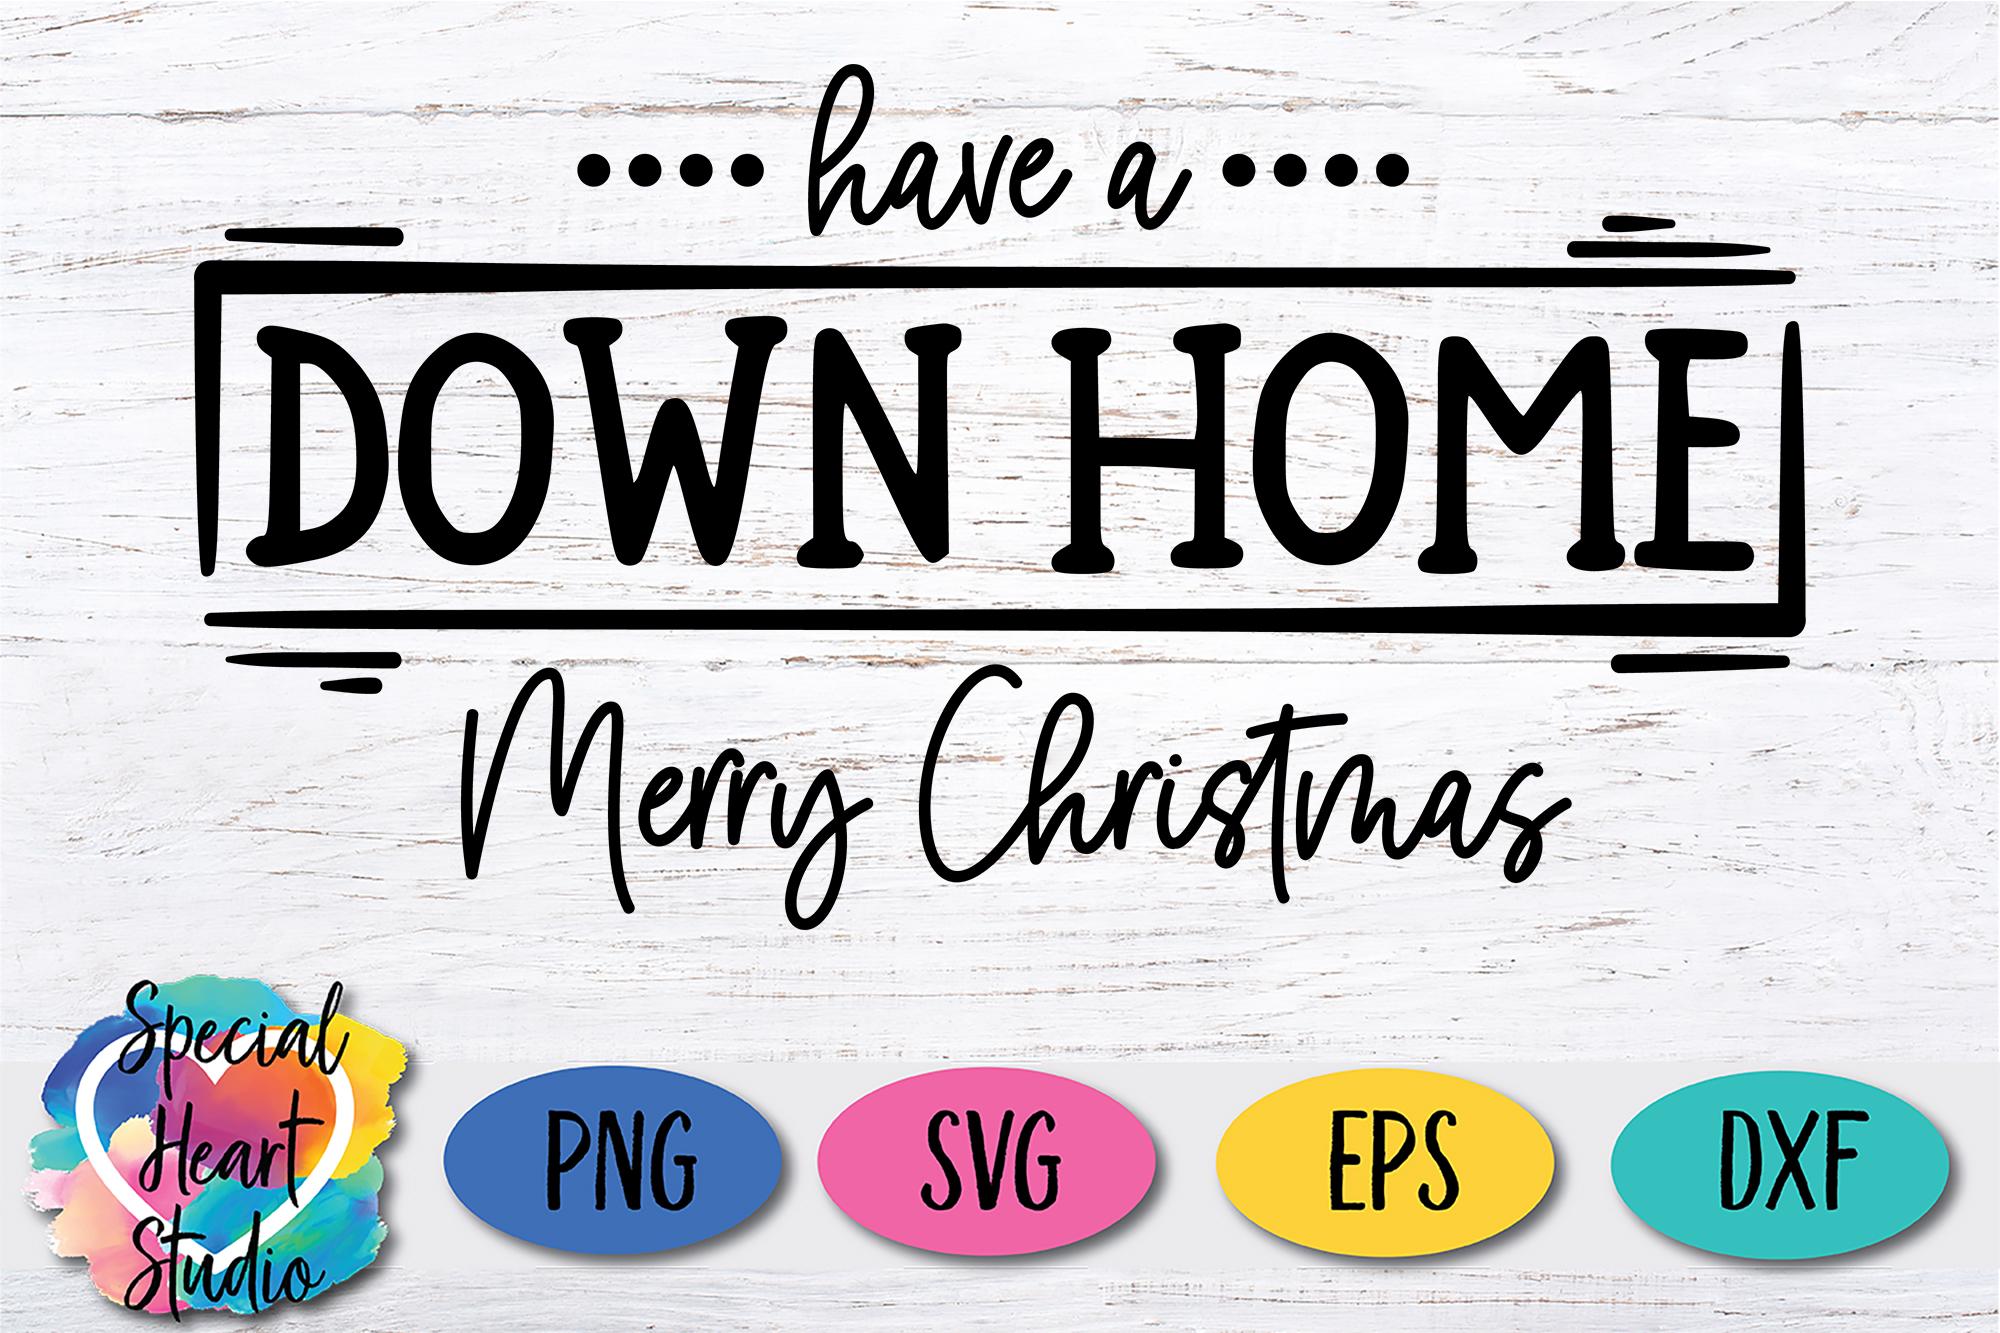 Down Home Christmas - A Christmas SVG Cut File example image 2